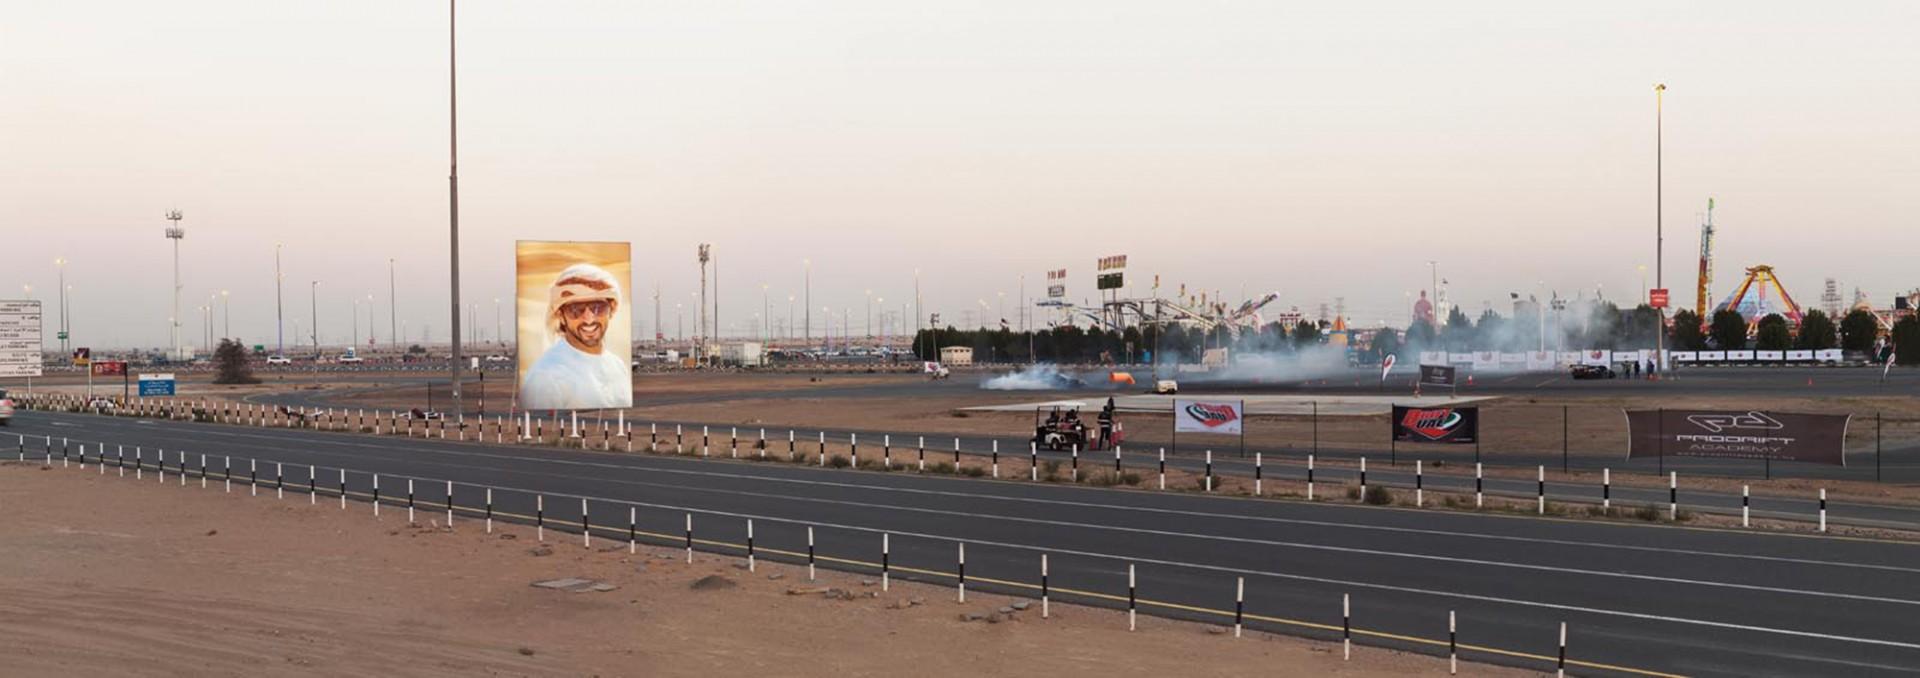 Dubailand Global Village.  25°04'22''N 55°18'13''E